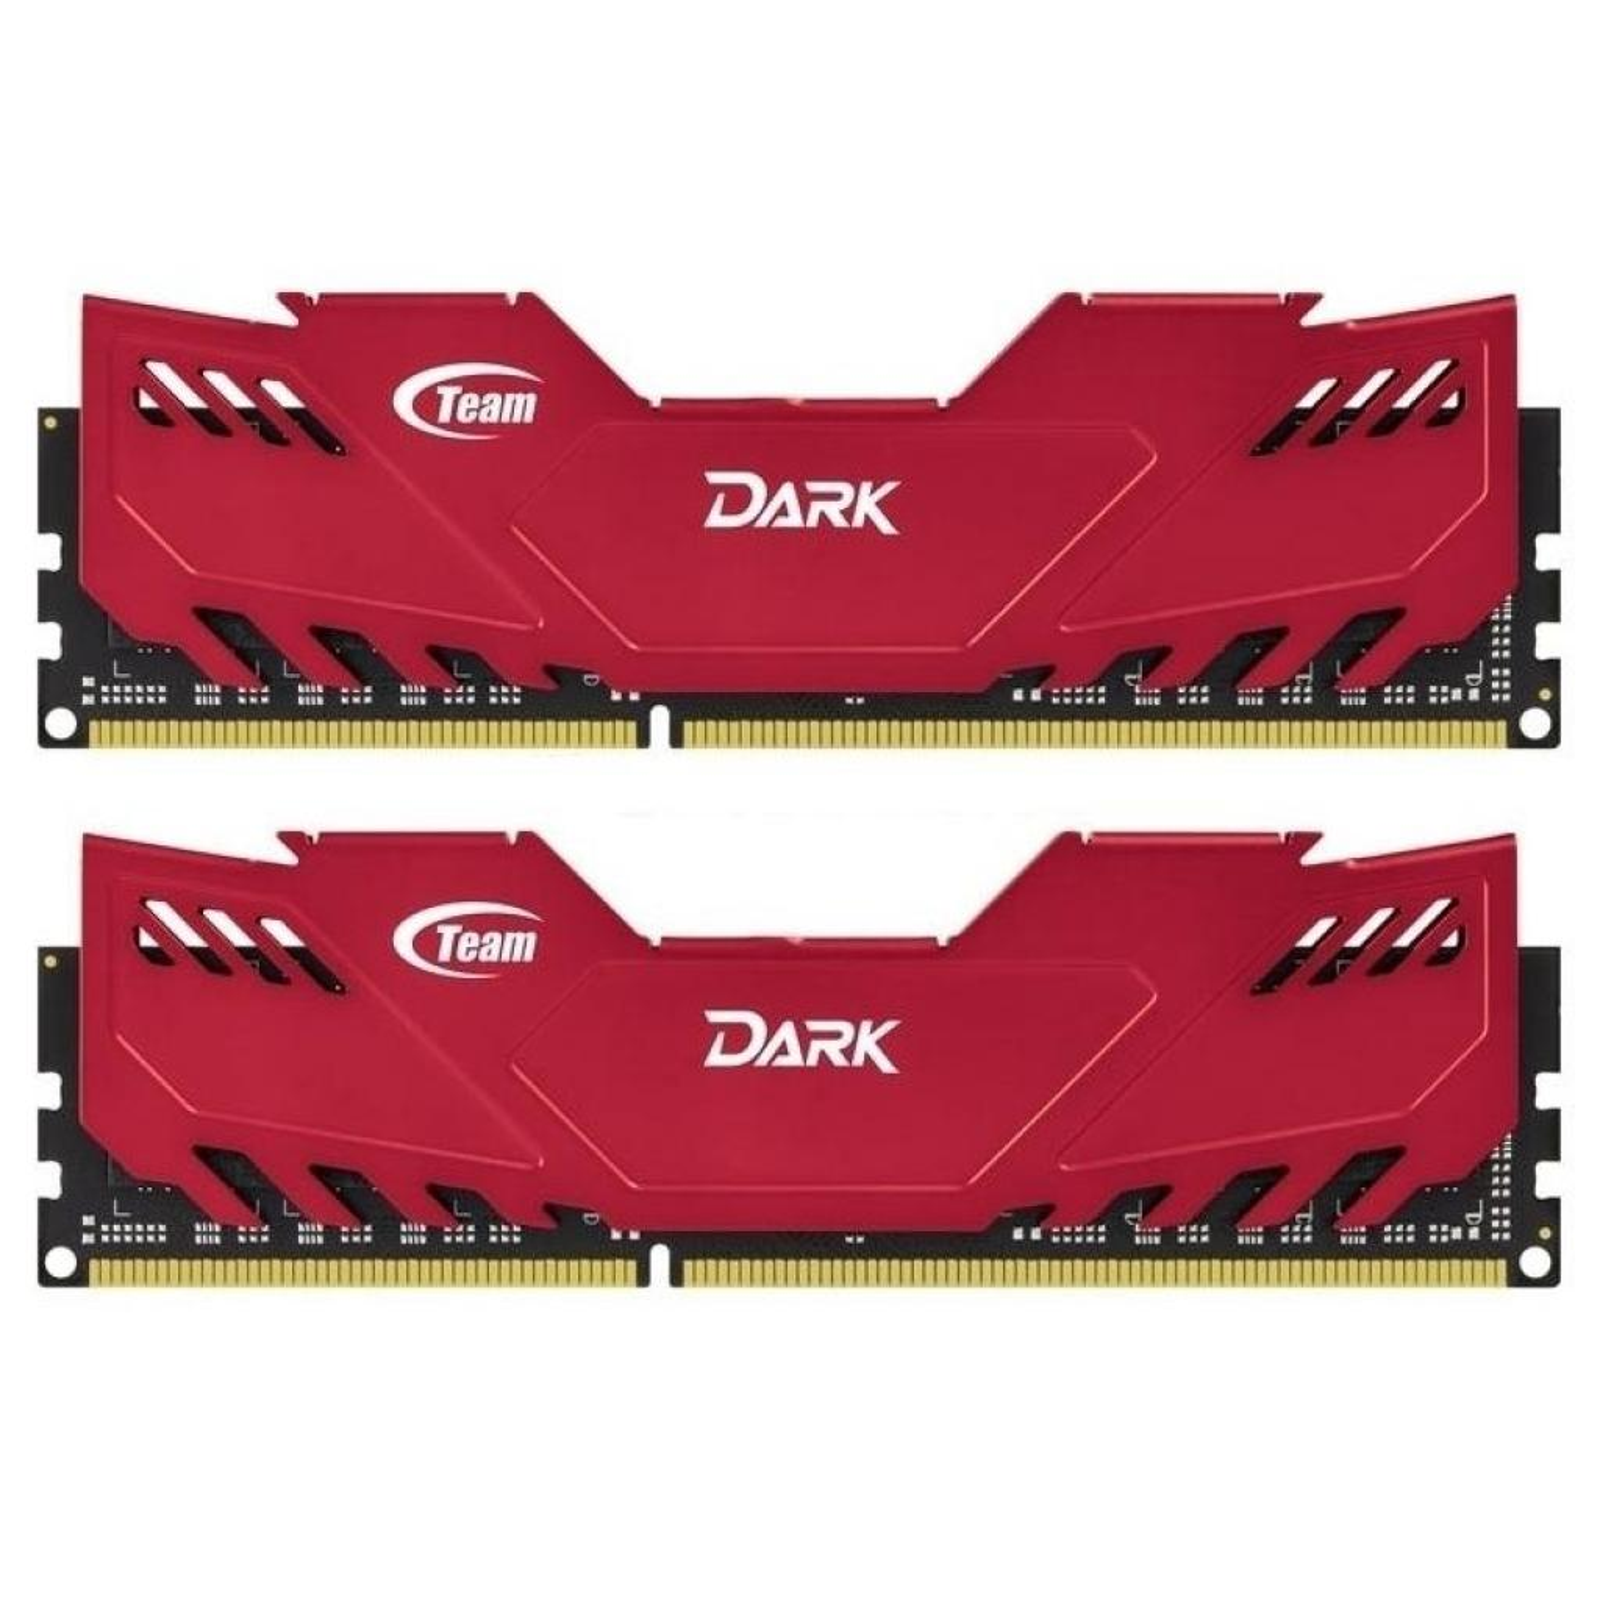 Модуль памяти для компьютера DDR3 16GB (2x8GB) 1600 MHz Dark Series Red Team (TDRED316G1600HC9DC01)